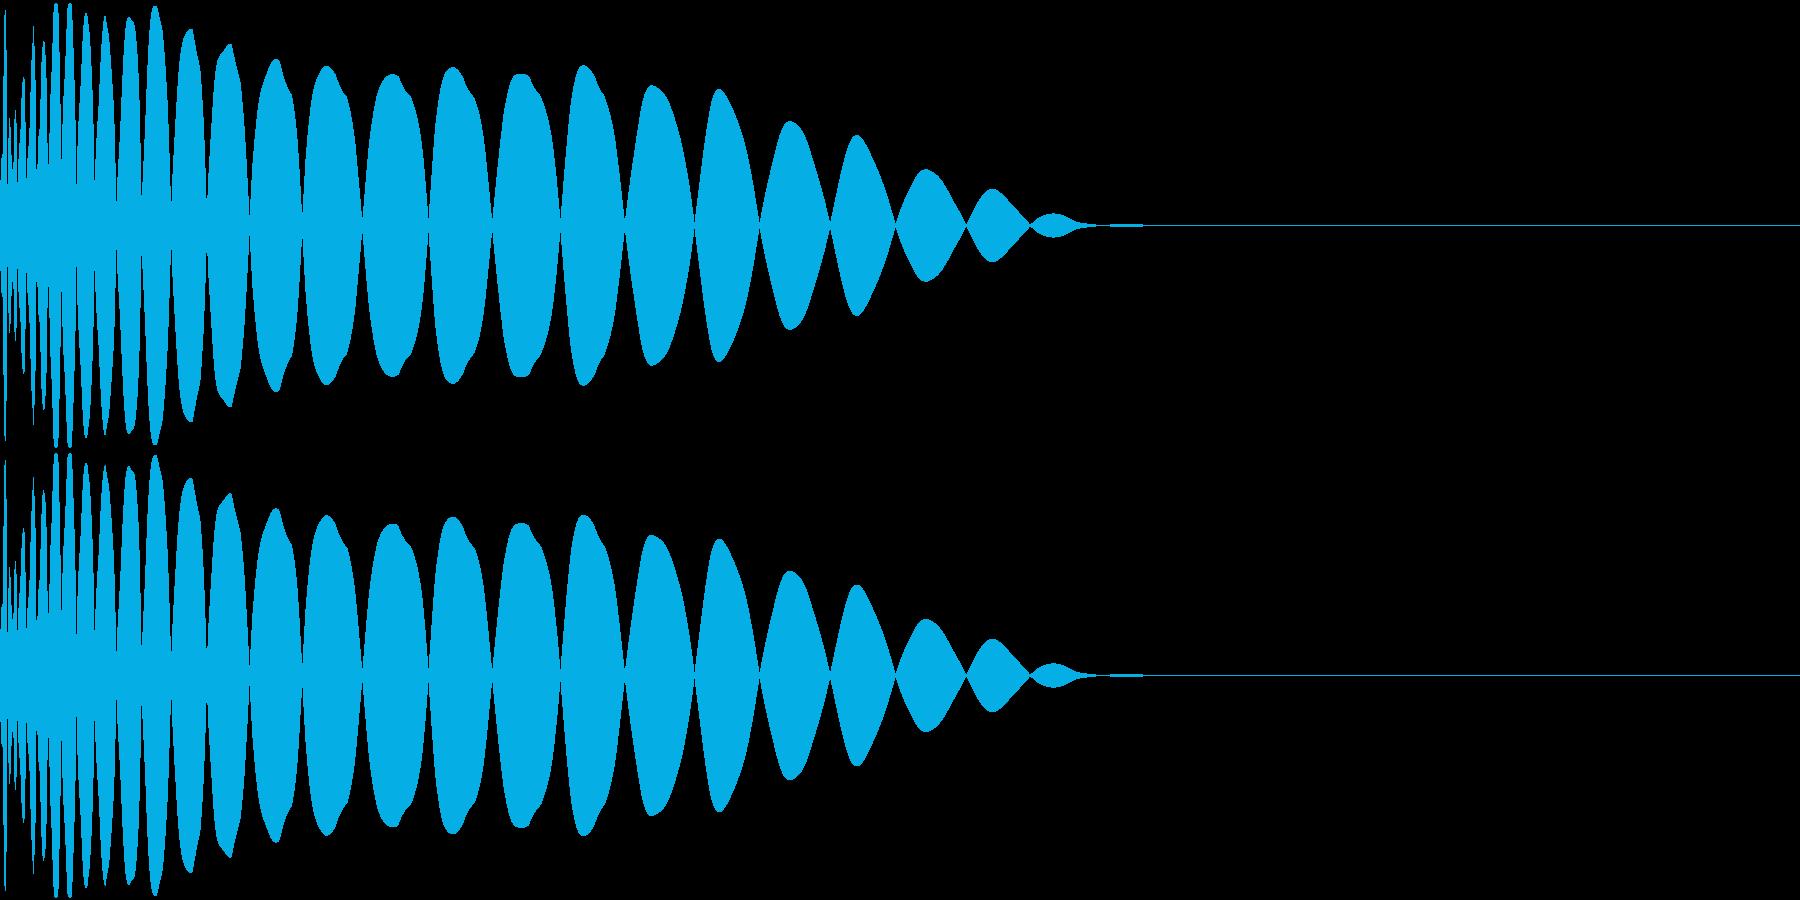 DTM Kick 54 オリジナル音源の再生済みの波形